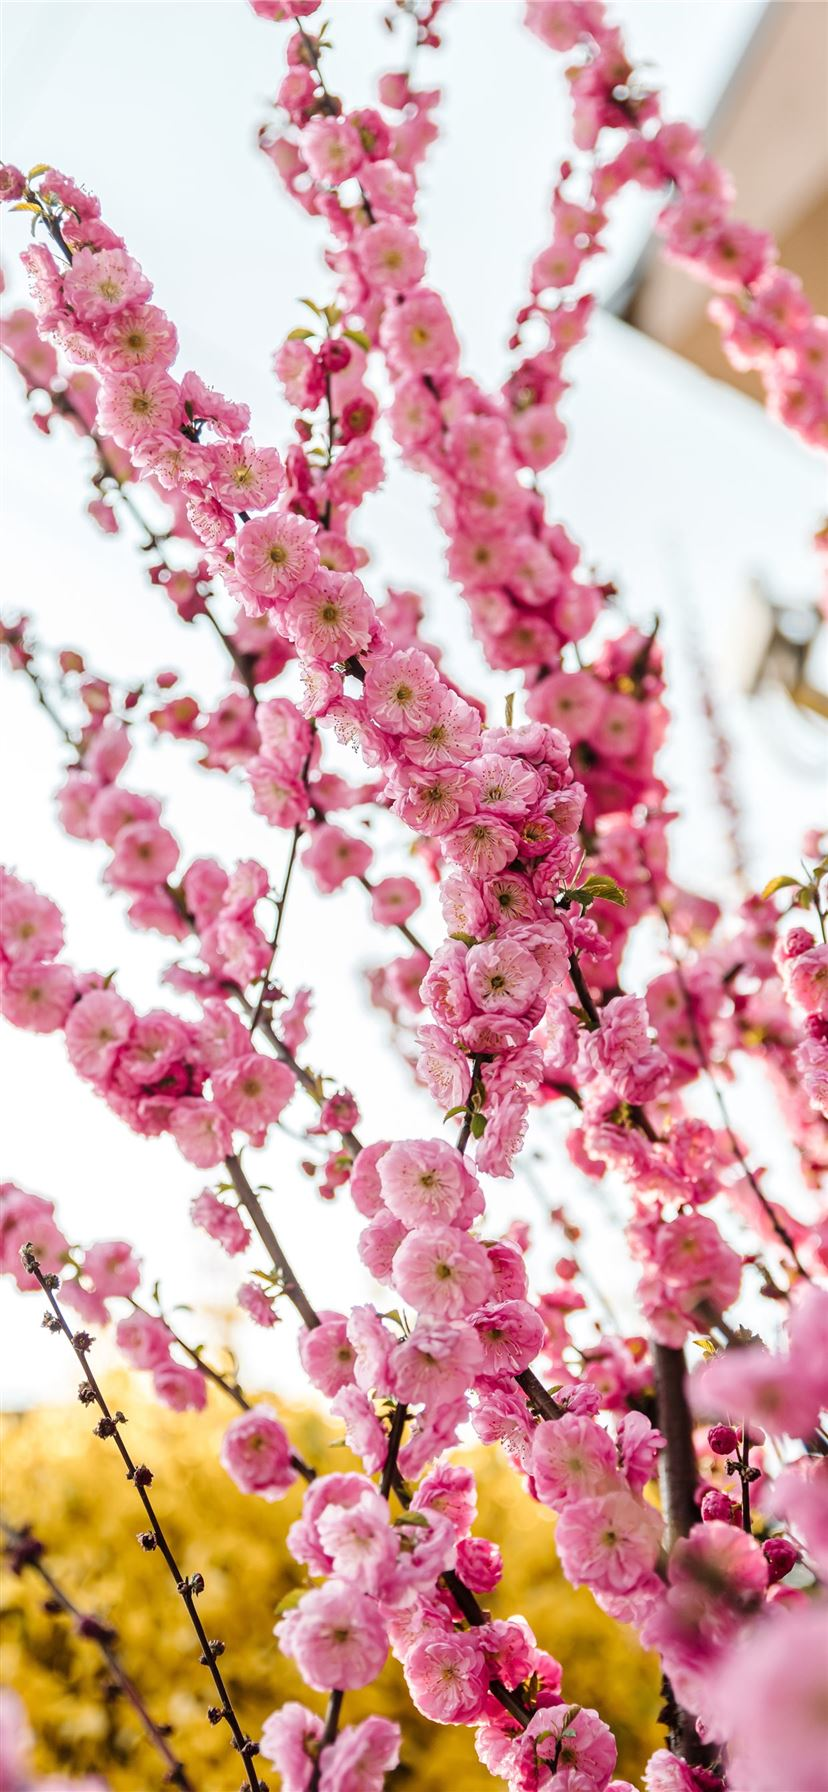 Best Cherry Blossom Iphone 11 Wallpapers Hd Ilikewallpaper